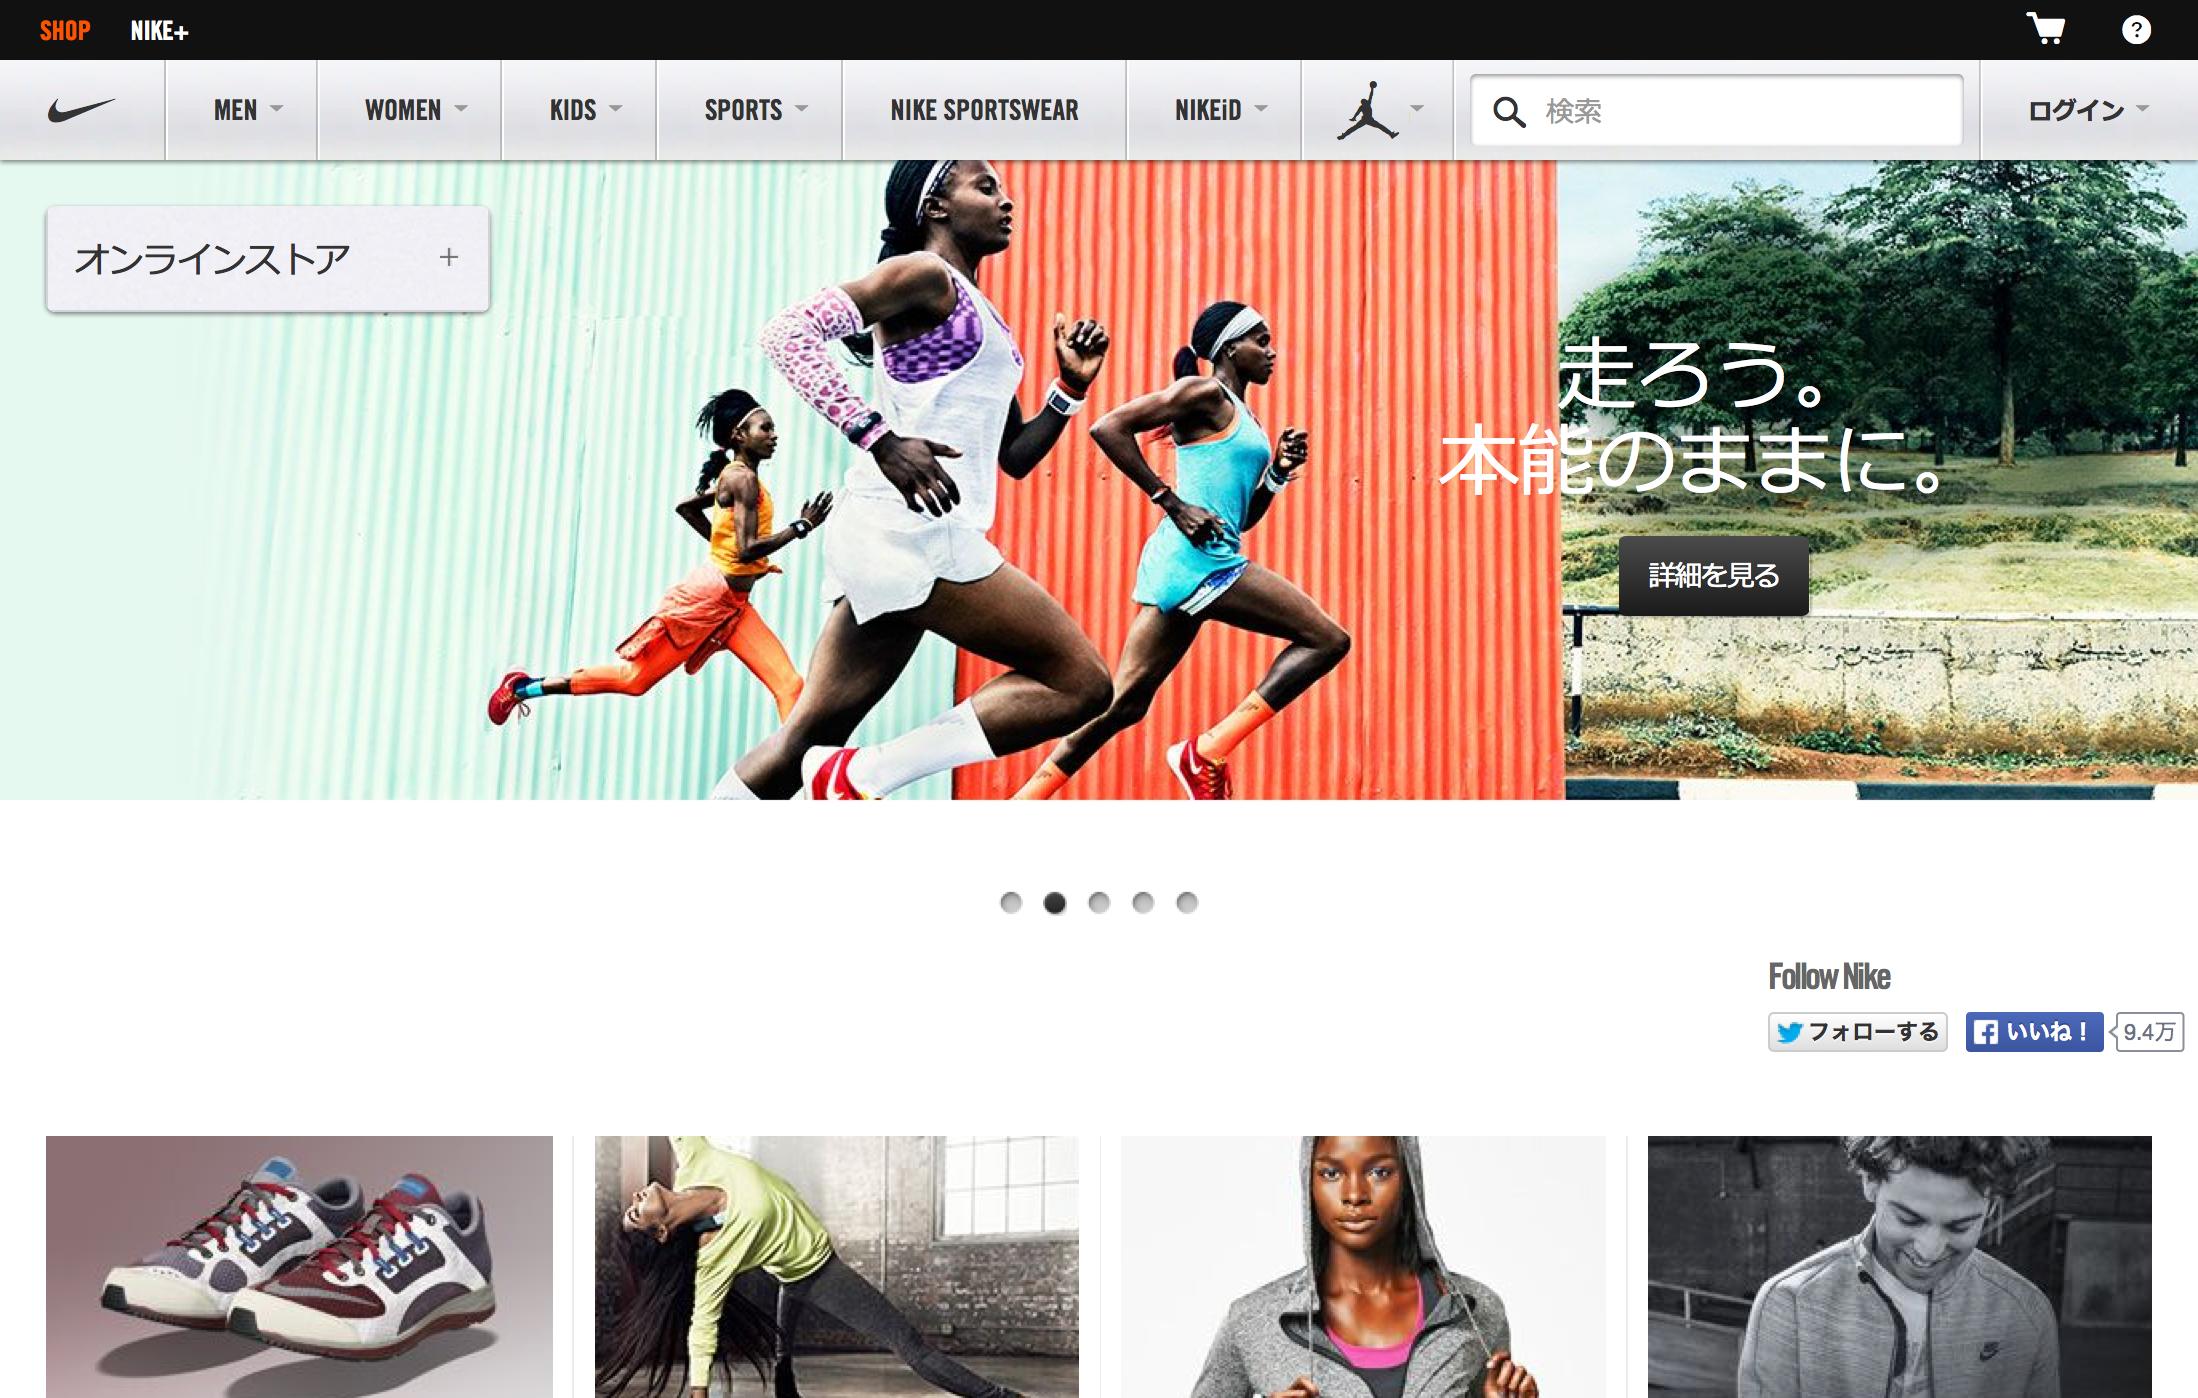 Nike (nike.com) ホームのメインビジュアルのカルーセル